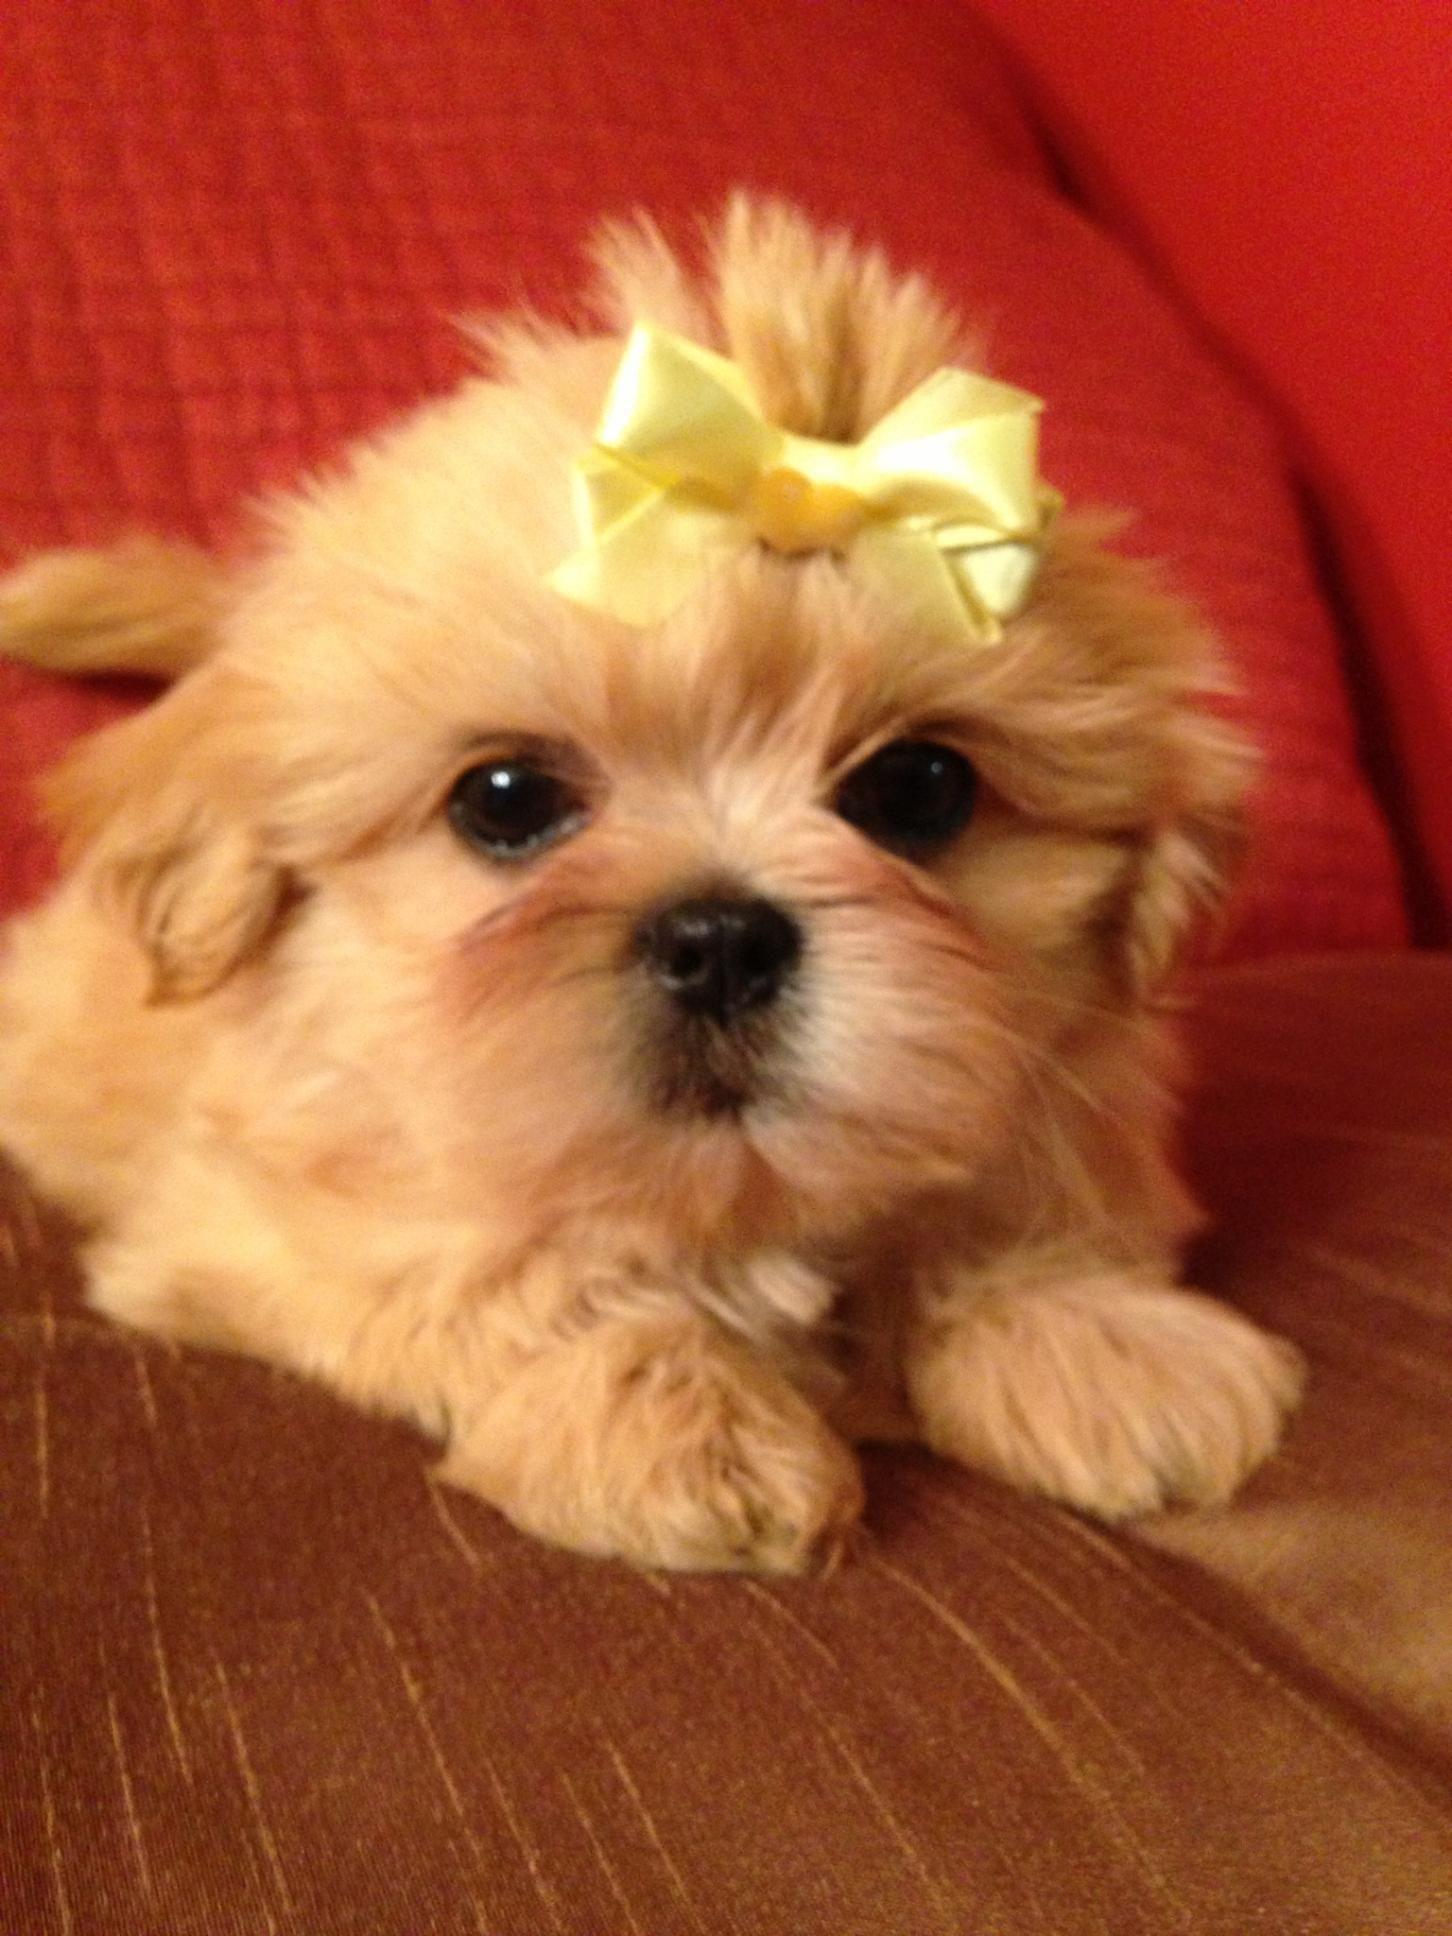 Shihtzu Dogs Omg I Want Shih Tzu Dog Cute Dogs Shih Tzu